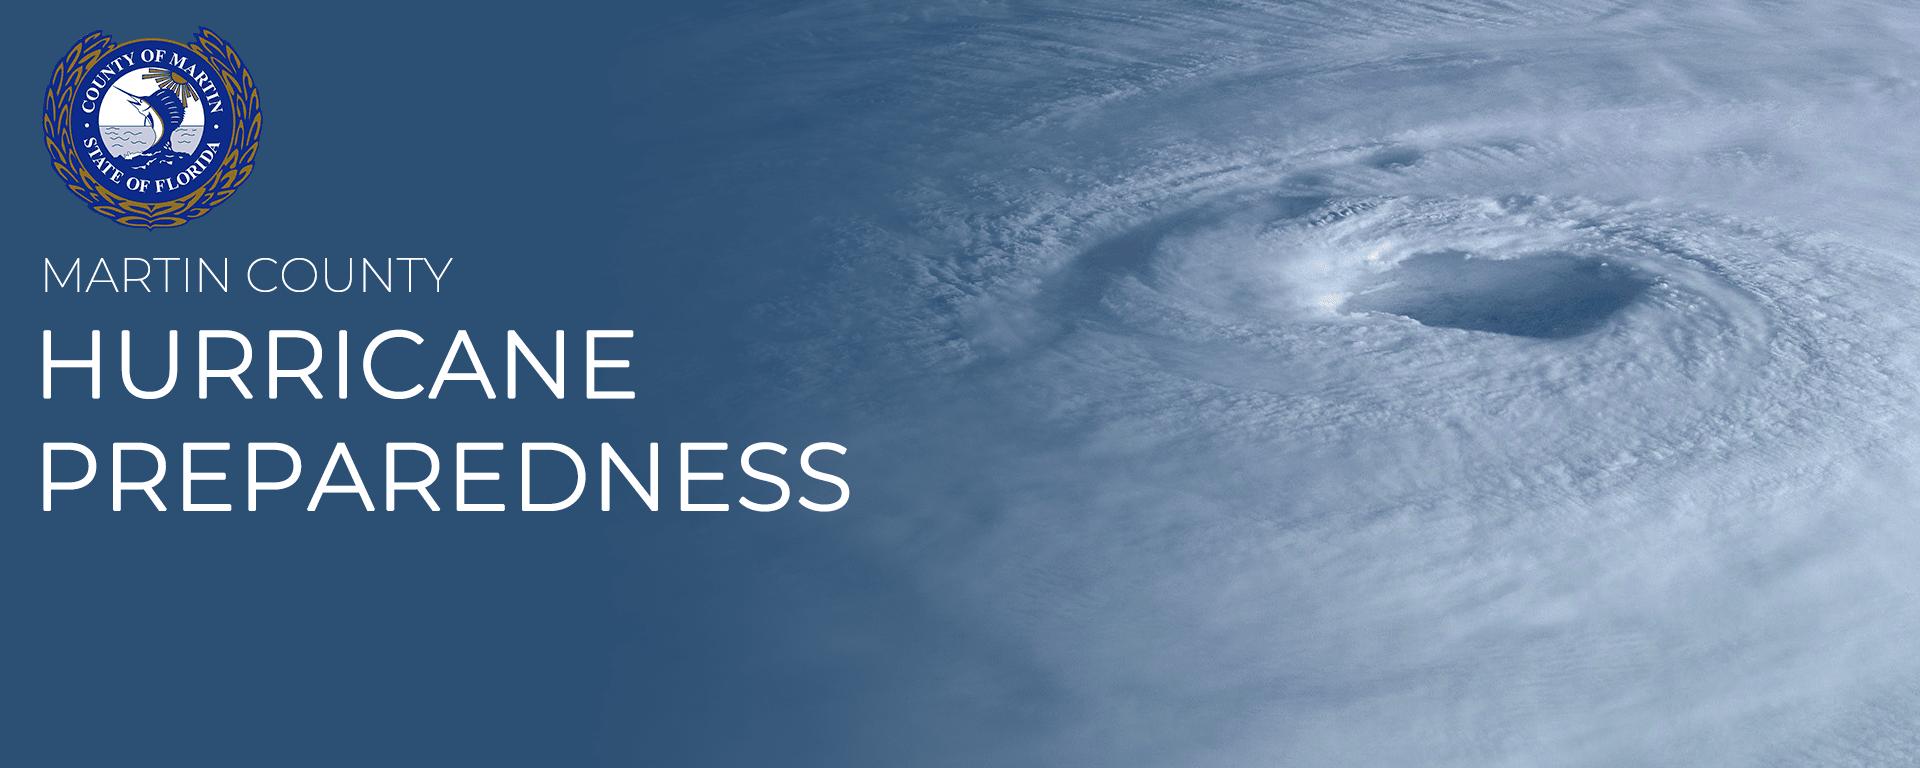 Martin County Hurricane Preparedness